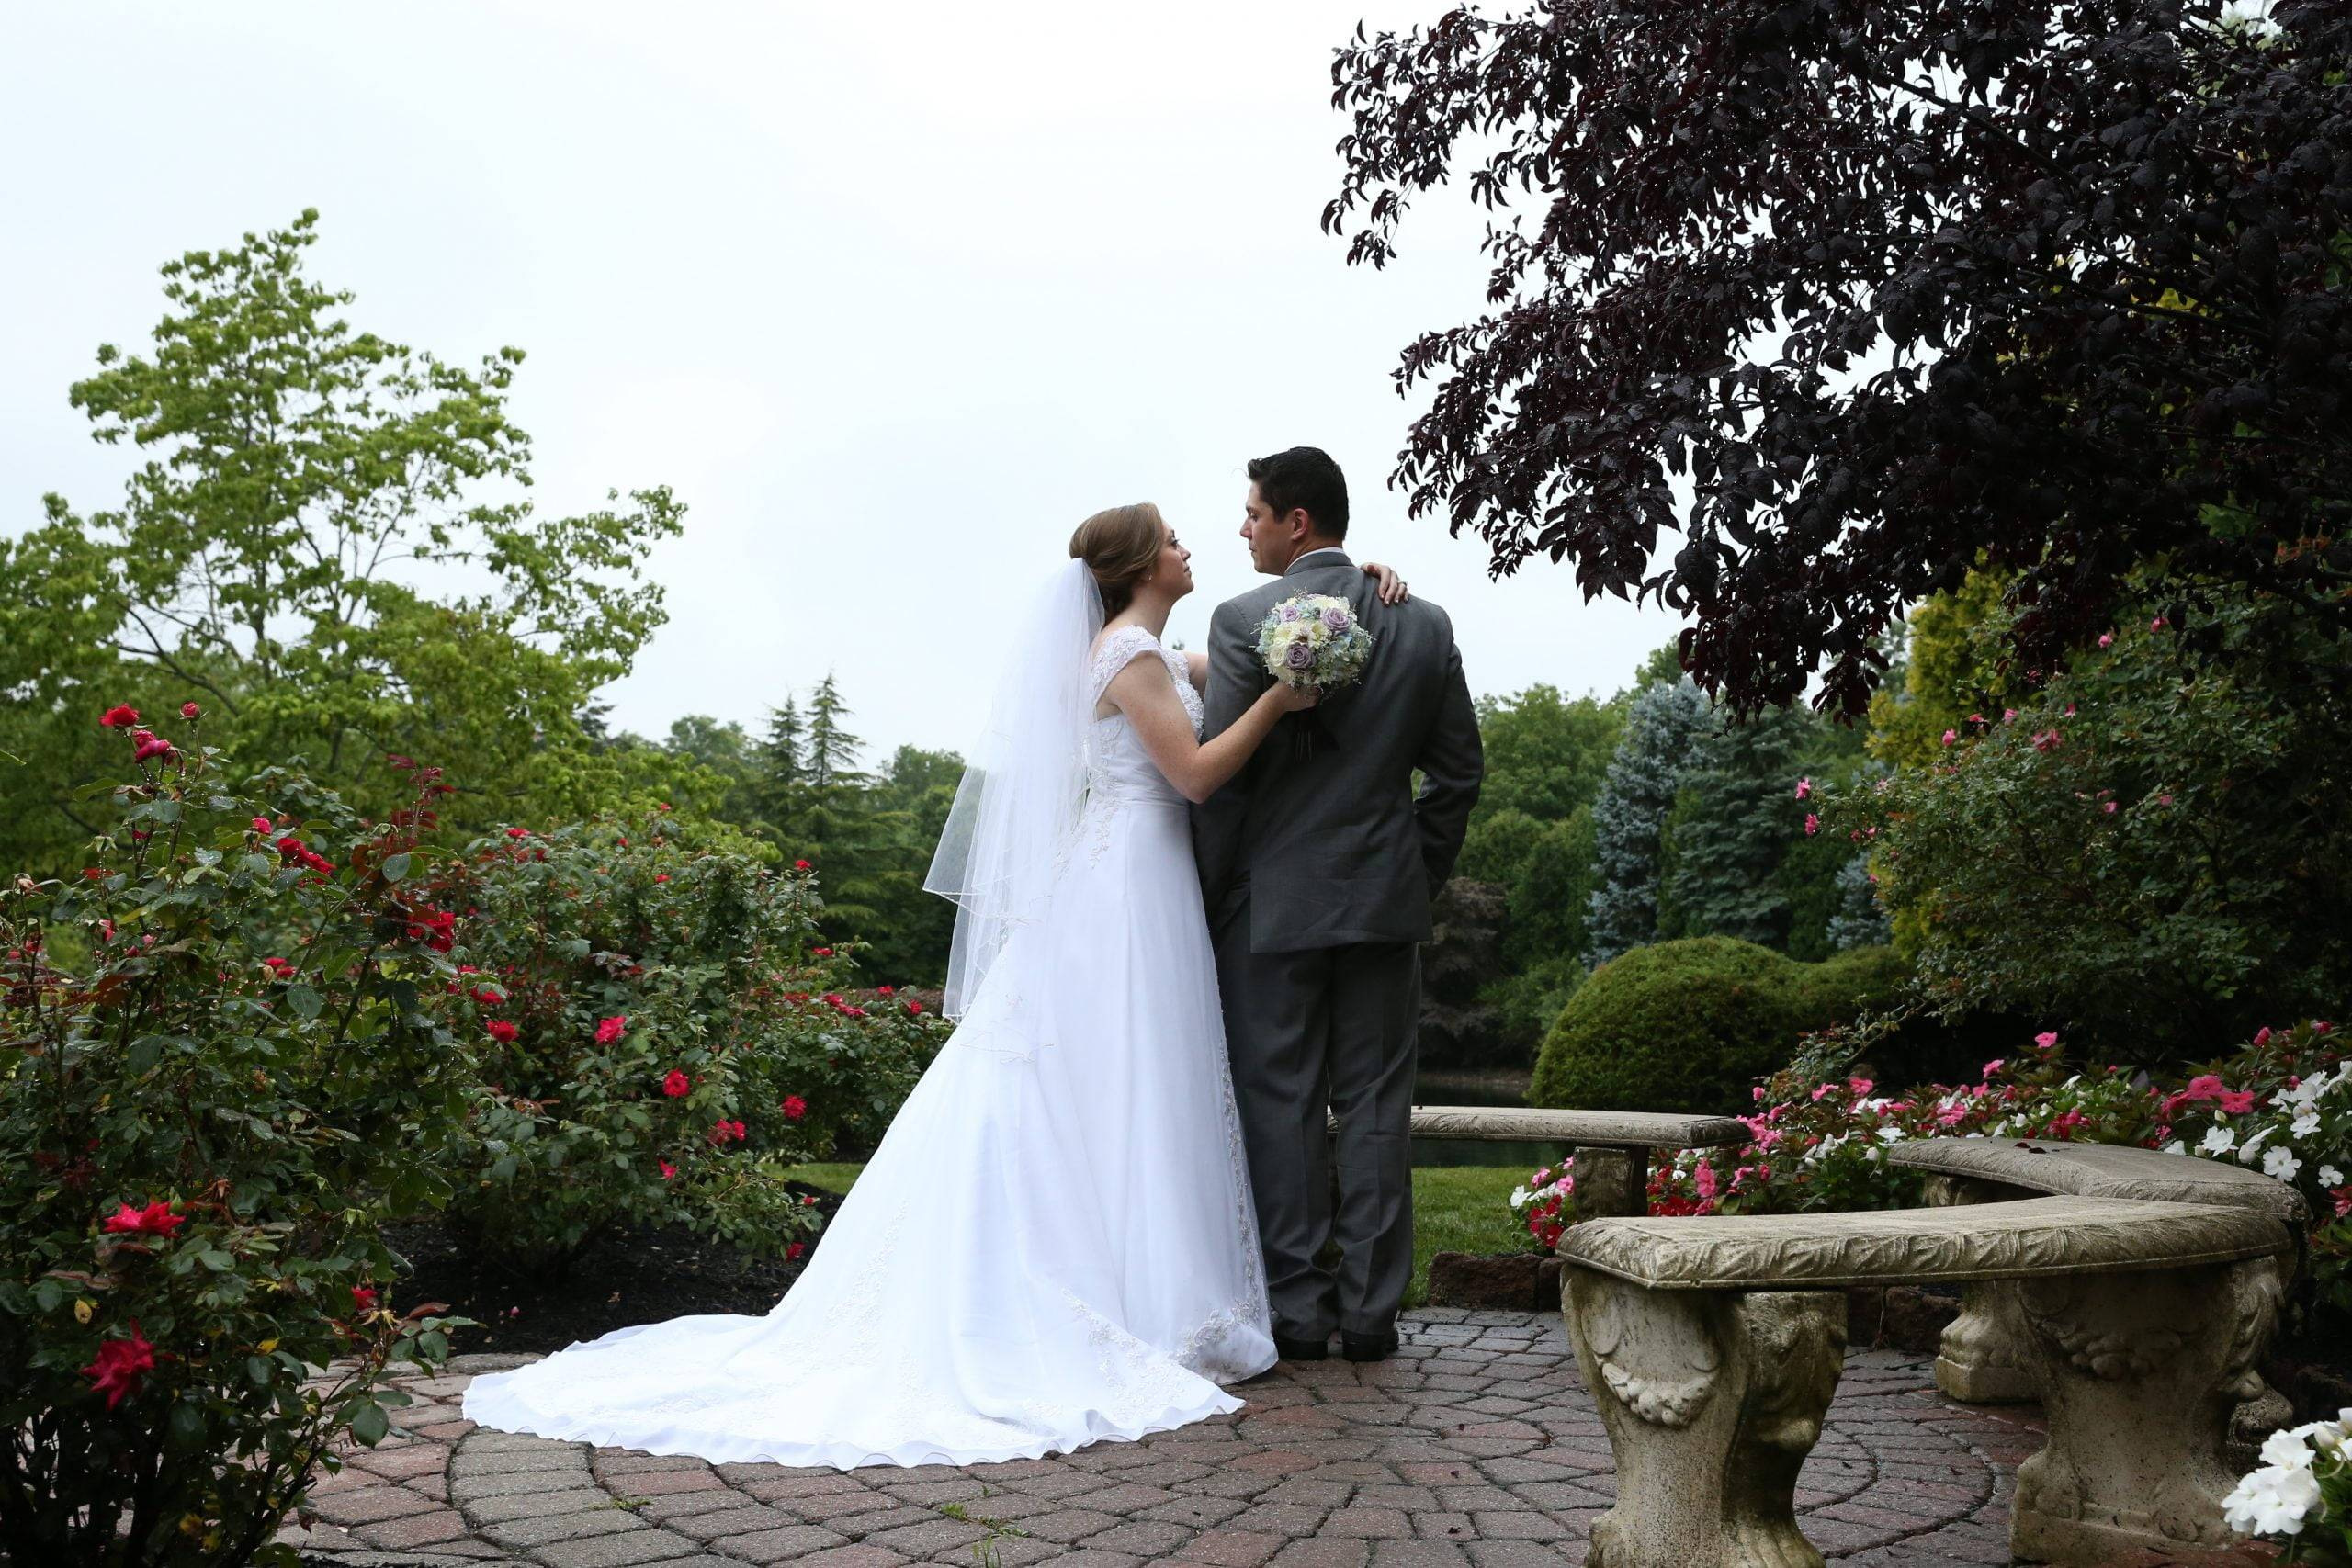 Bridgewater Manor bride and groom on patio